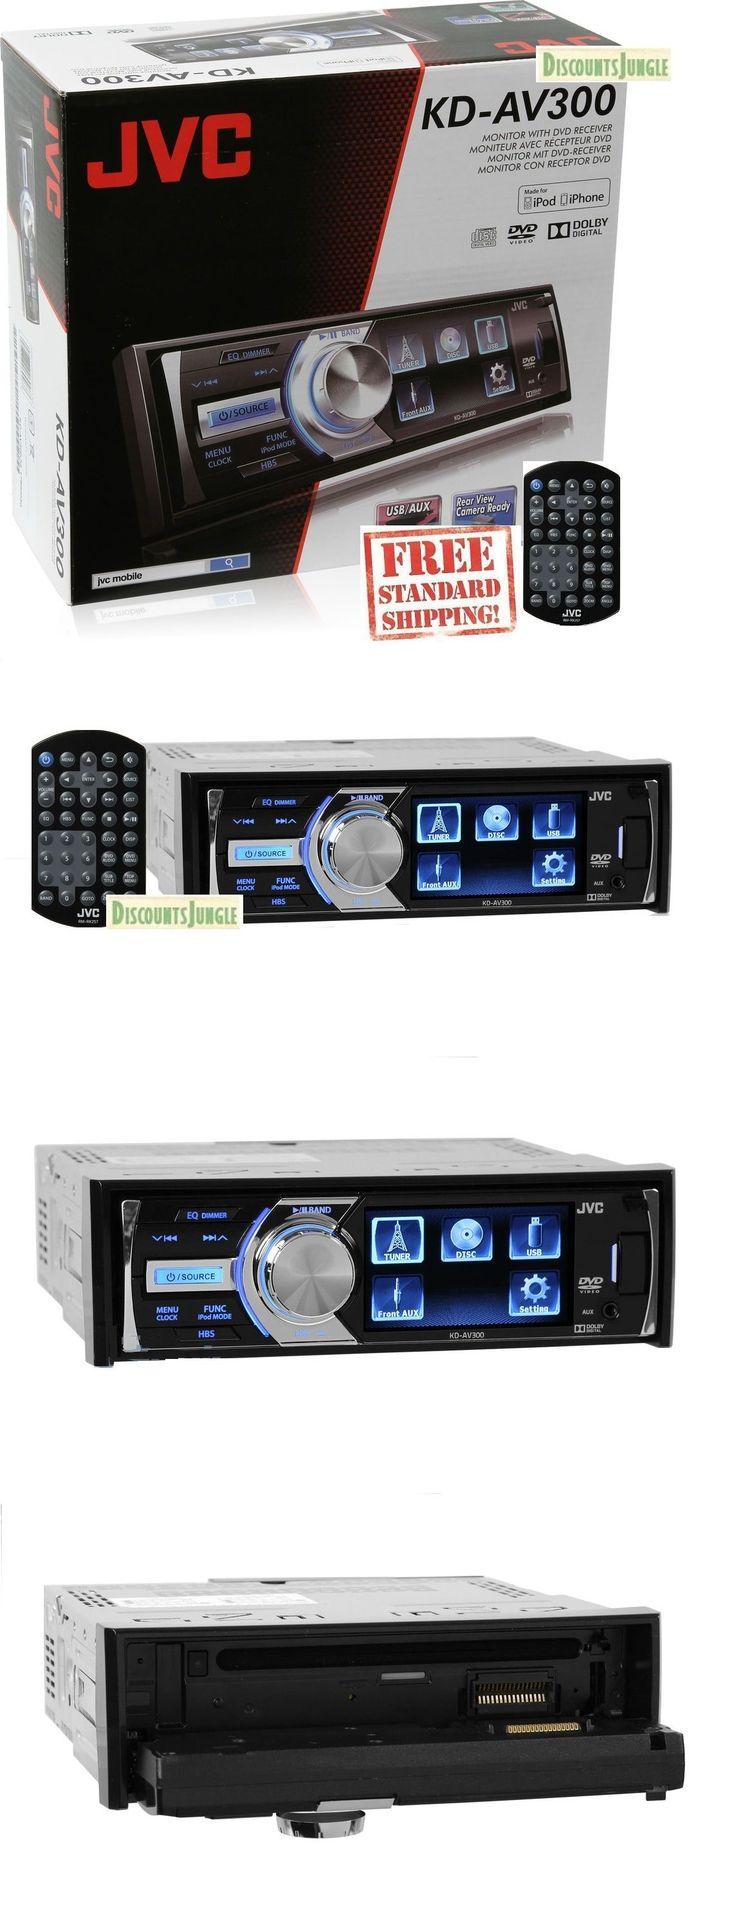 Car Audio In-Dash Units: New Jvc Kd-Av300 Single Din 3 Lcd Dvd Cd Usb Aux Fm Car Stereo Jvc Kdav300 -> BUY IT NOW ONLY: $109.9 on eBay!